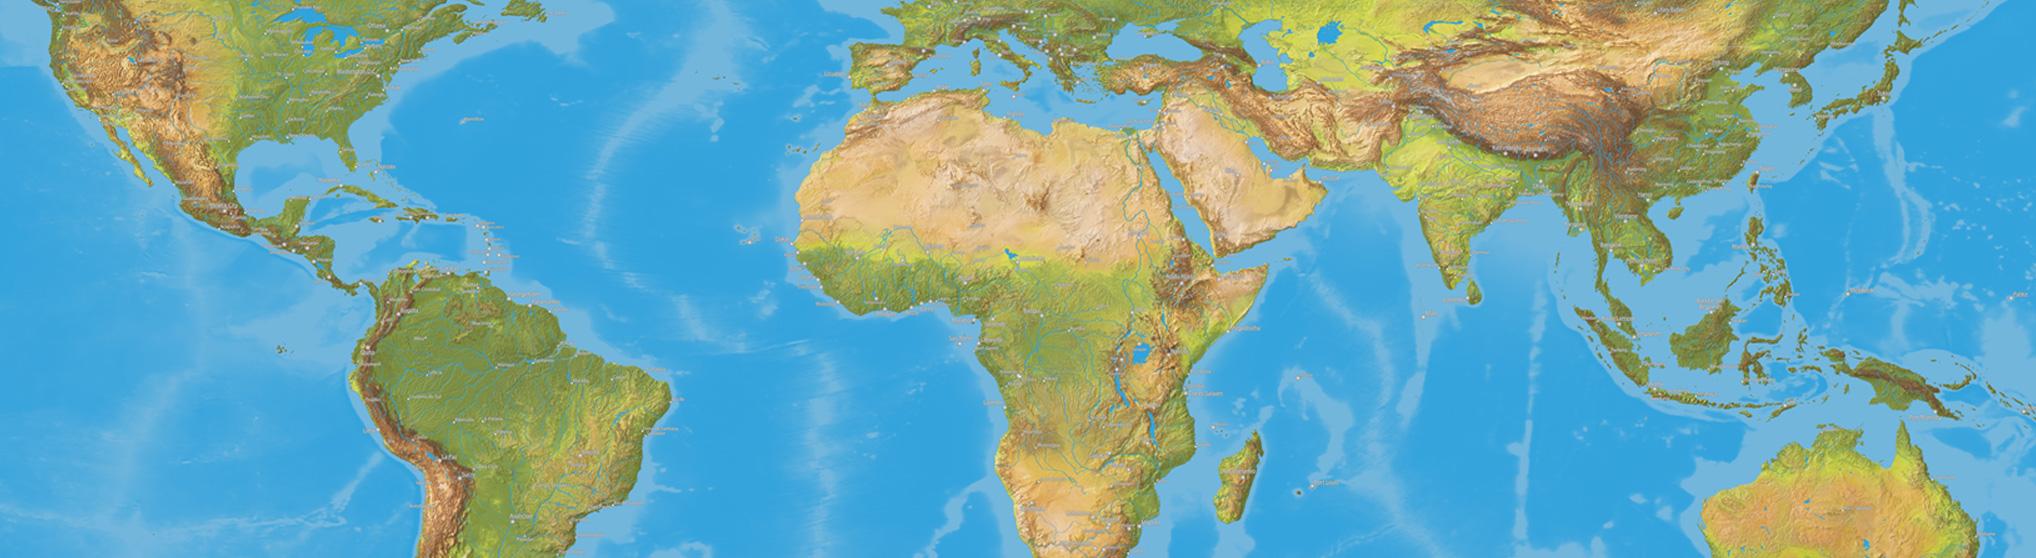 Vegetation Landkarte für Globus